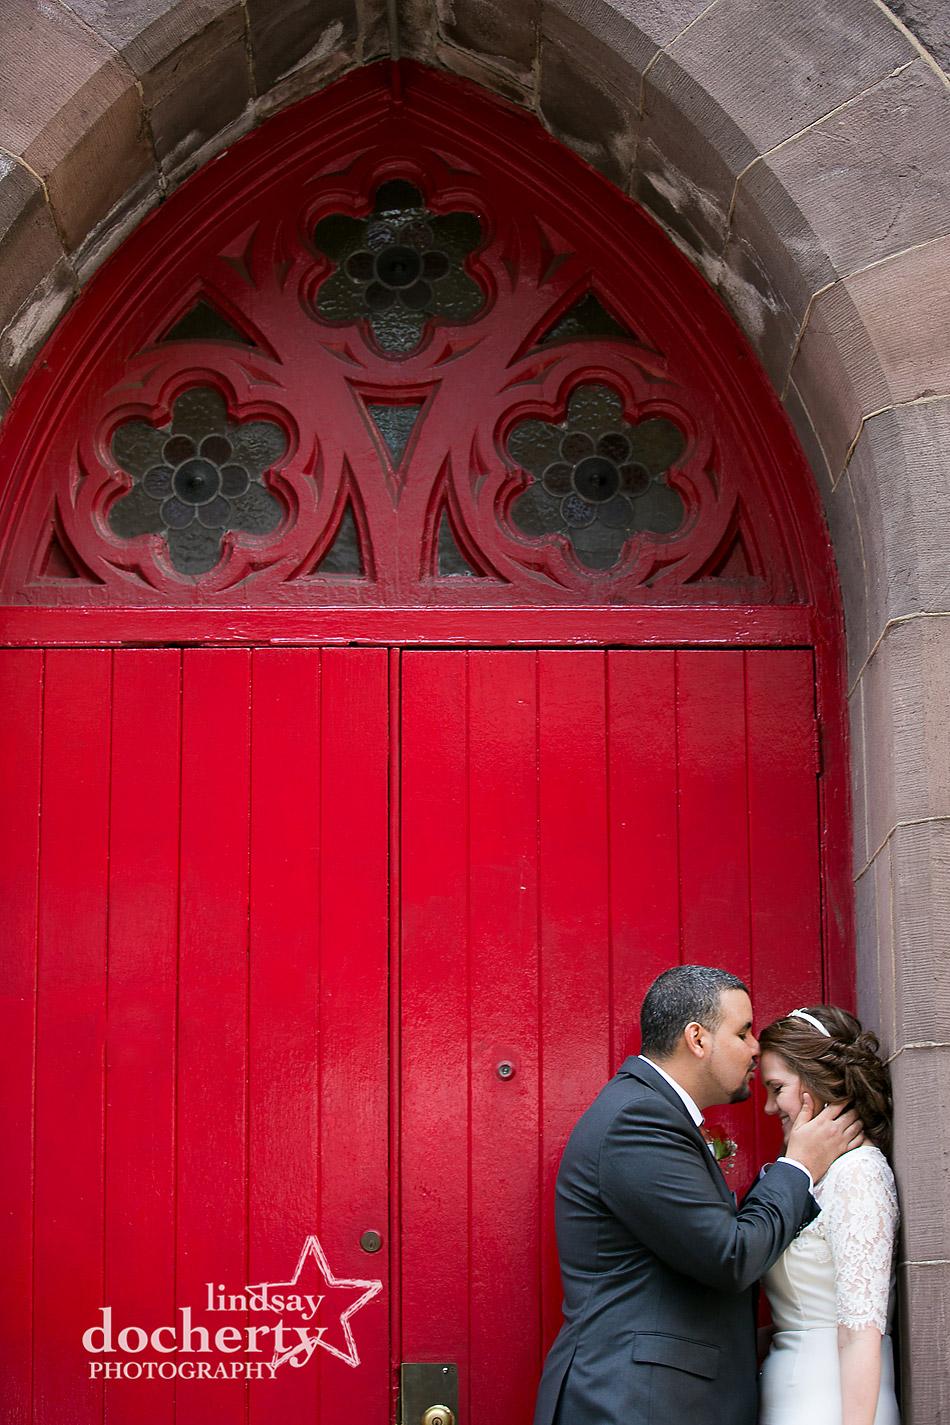 Philadelphia bride and groom kissing in front of red church door